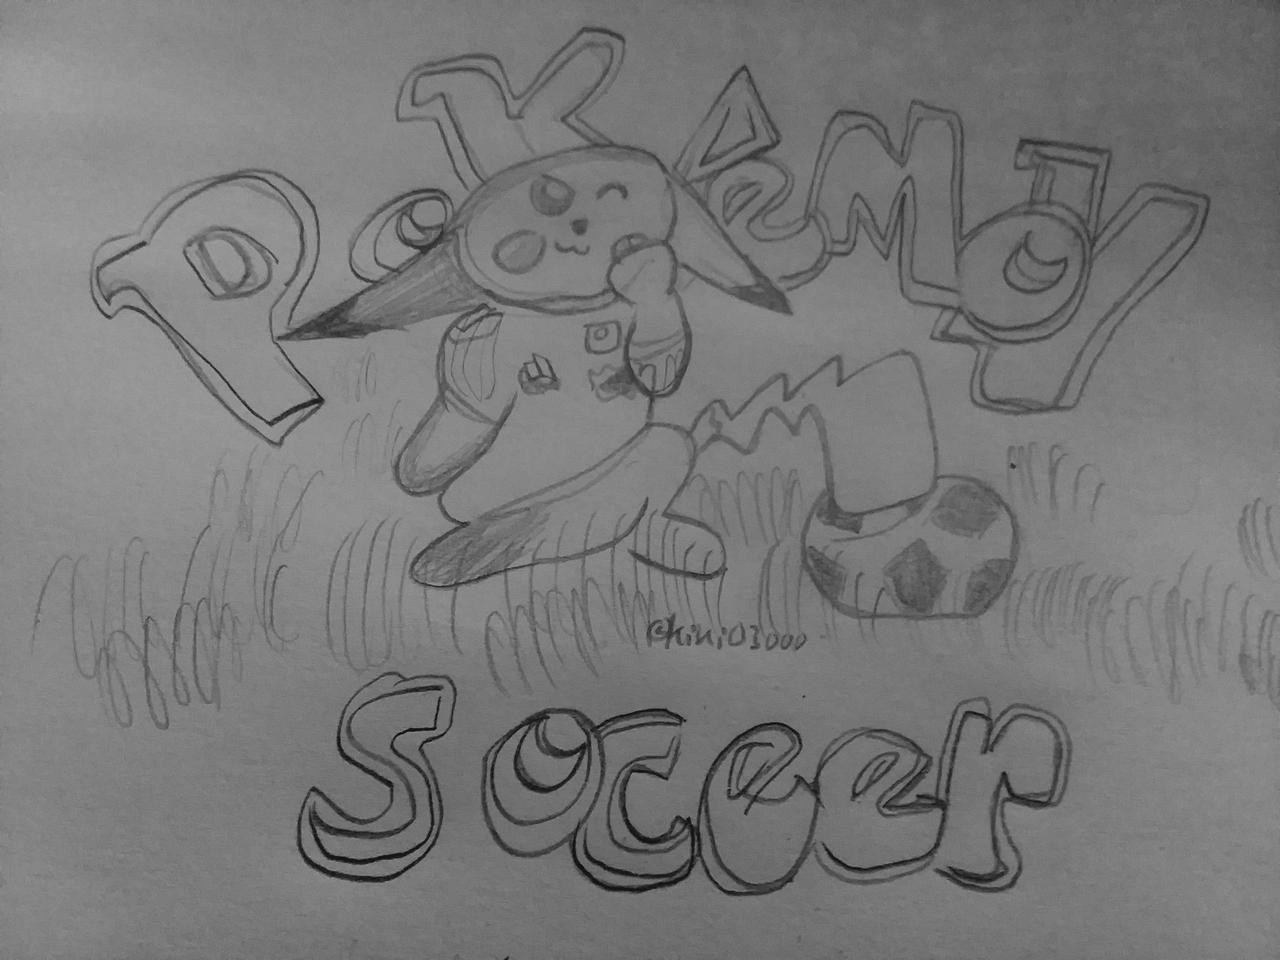 Pokemon Soccer F: A new series starting next year!